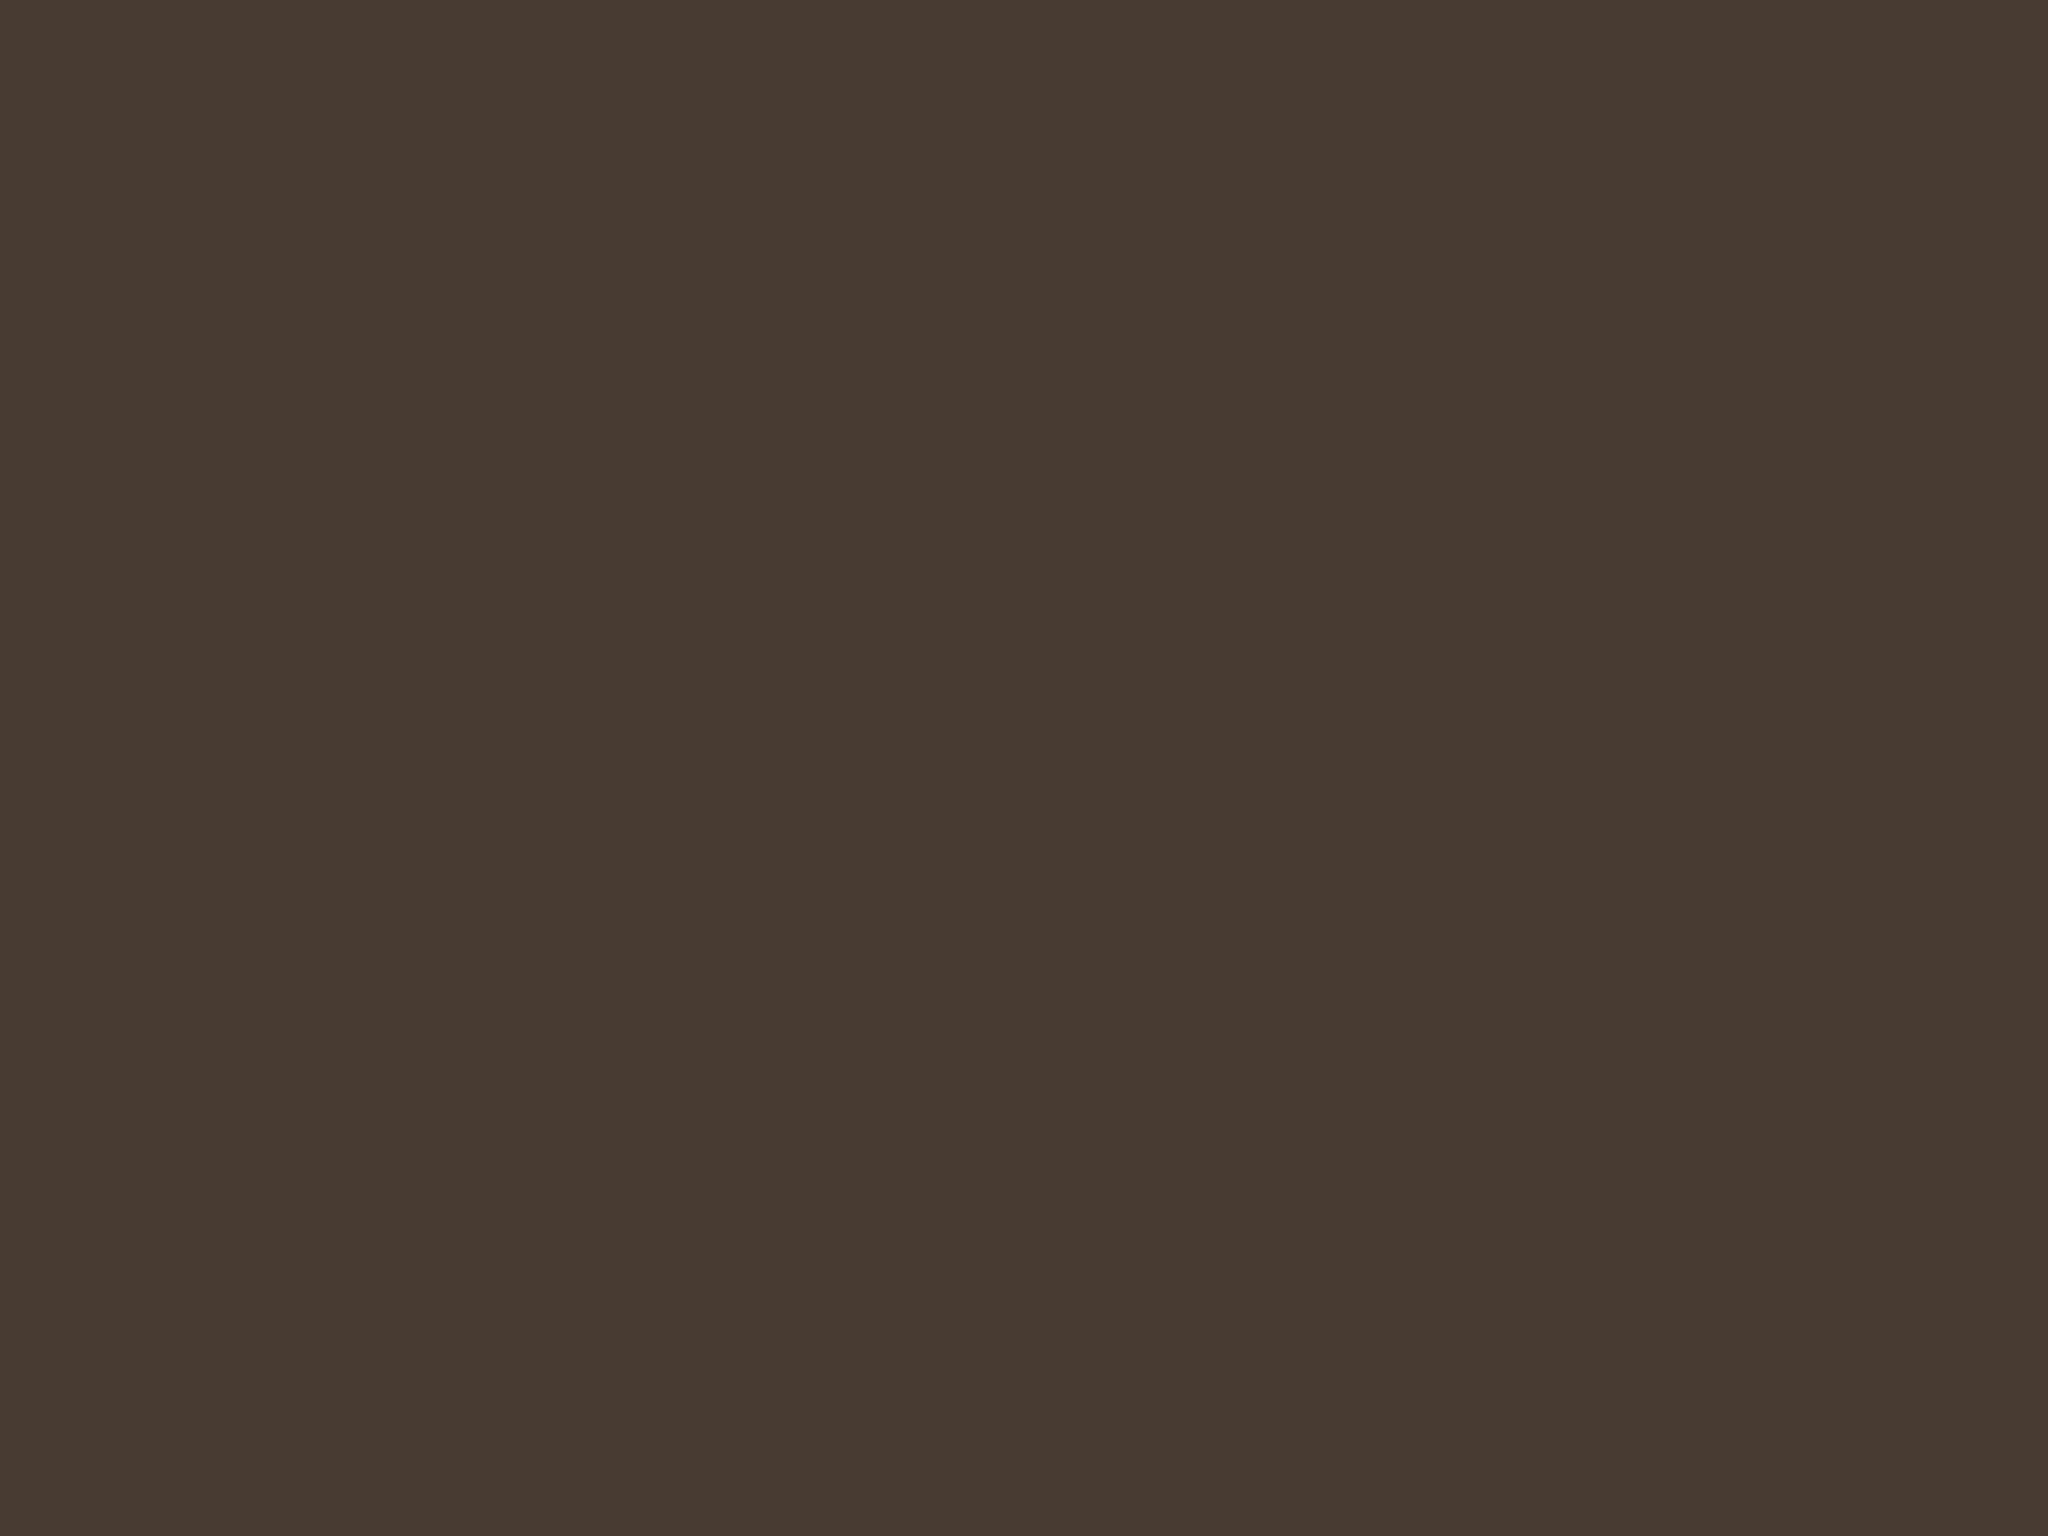 2048x1536 Dark Lava Solid Color Background